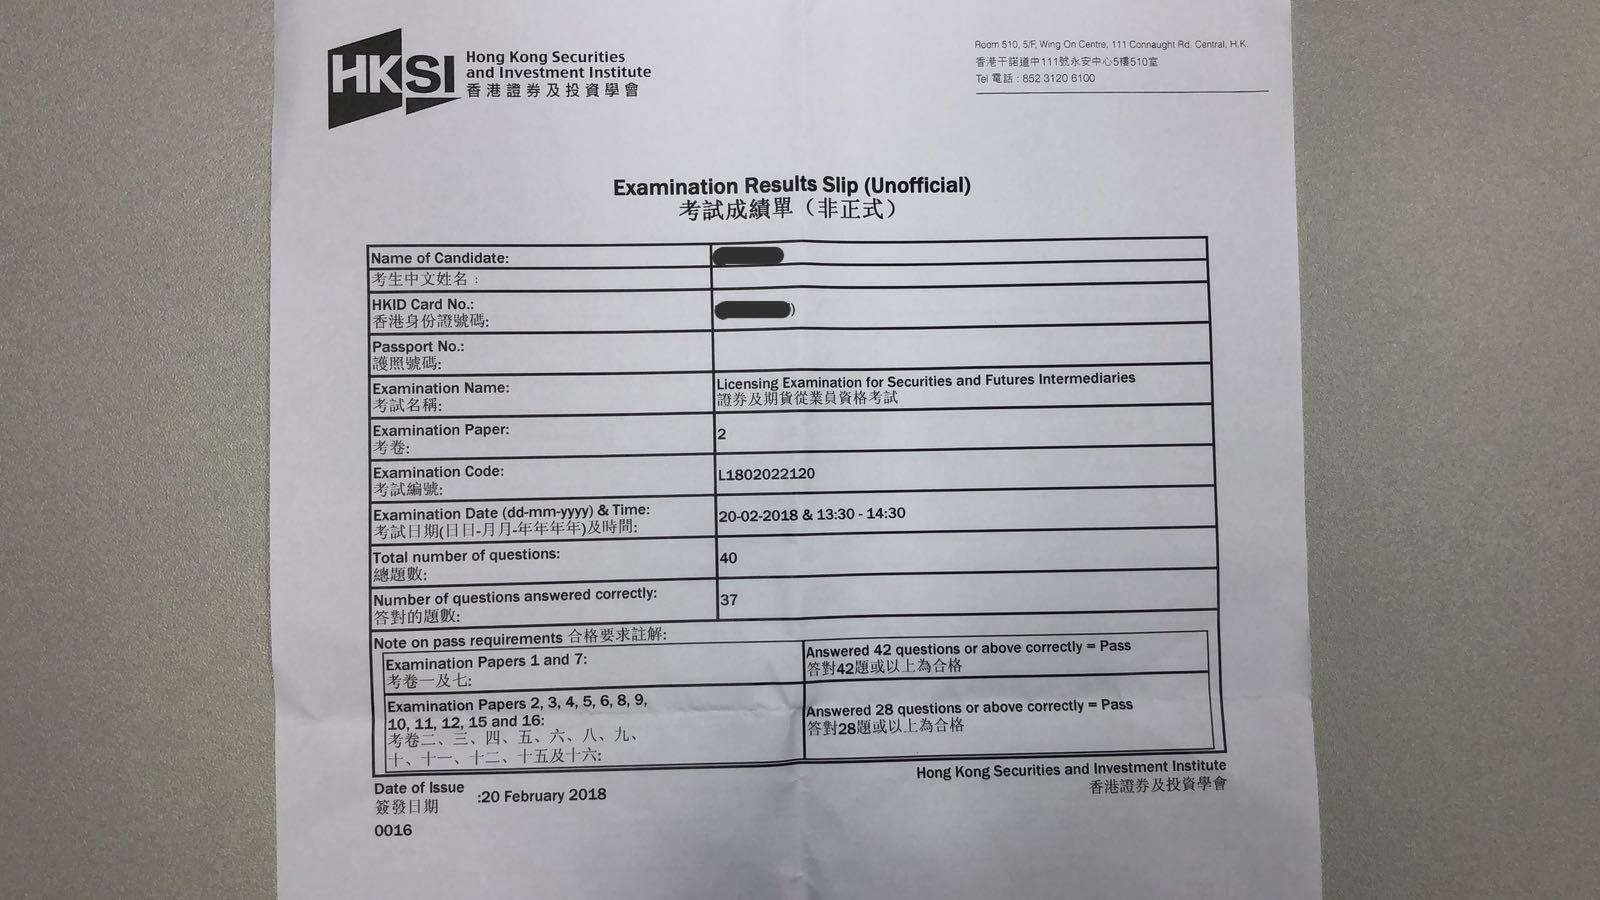 NHY 20/2/2018 LE Paper 2 證券期貨從業員資格考試卷二 Pass